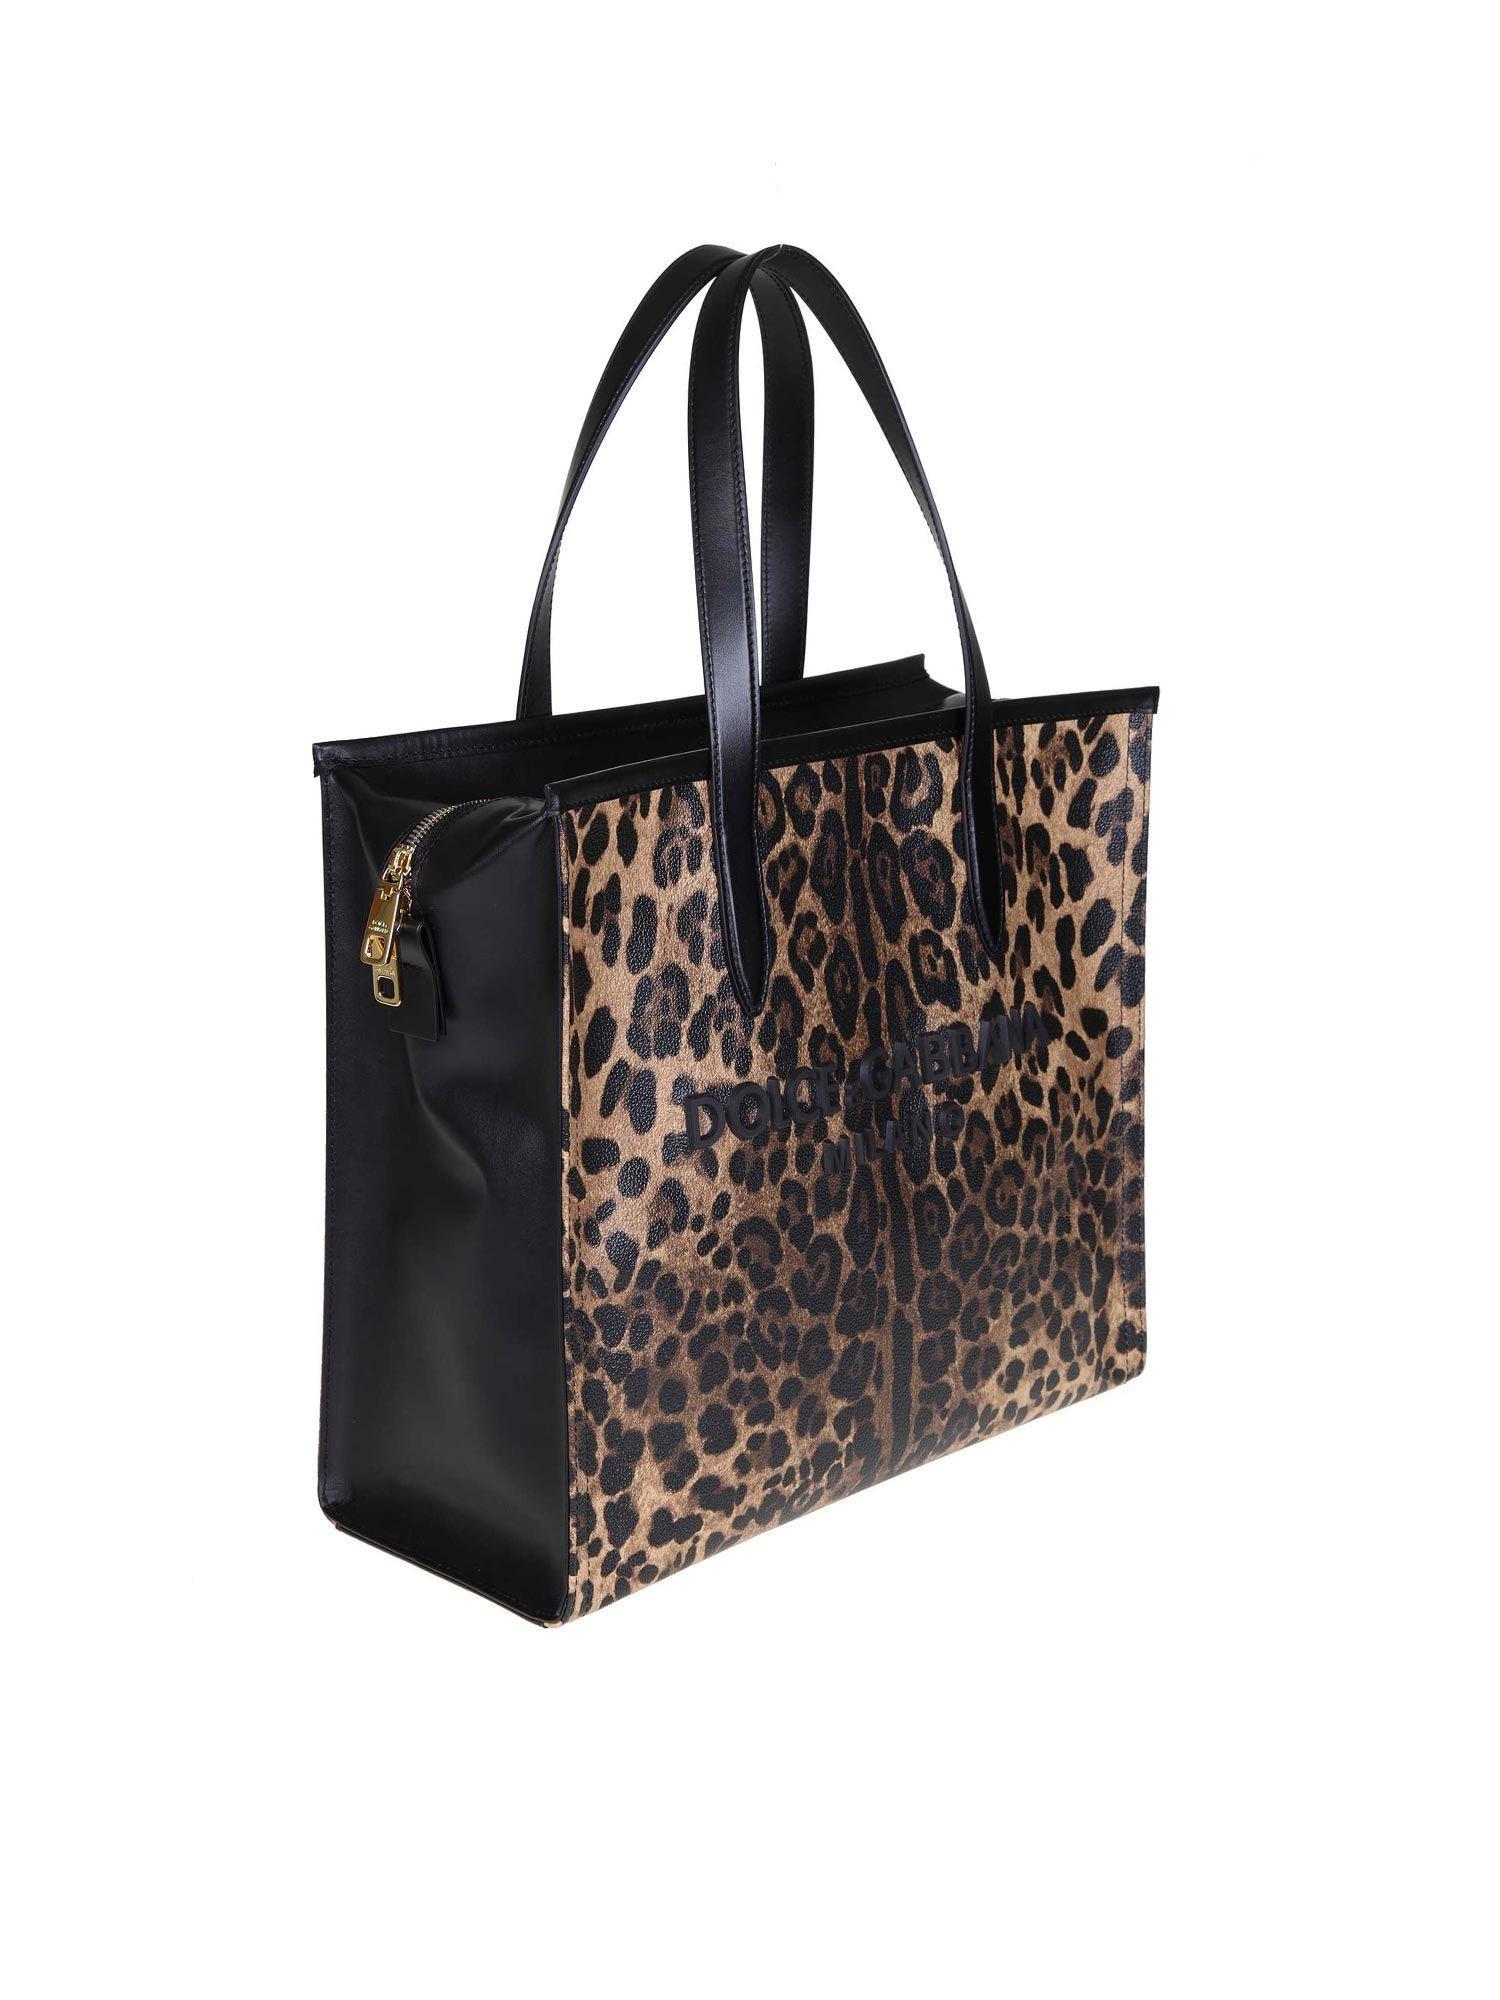 58ec5b373642 Lyst - Dolce   Gabbana Leopard Medium Market Shopping Tote in Black - Save  32%